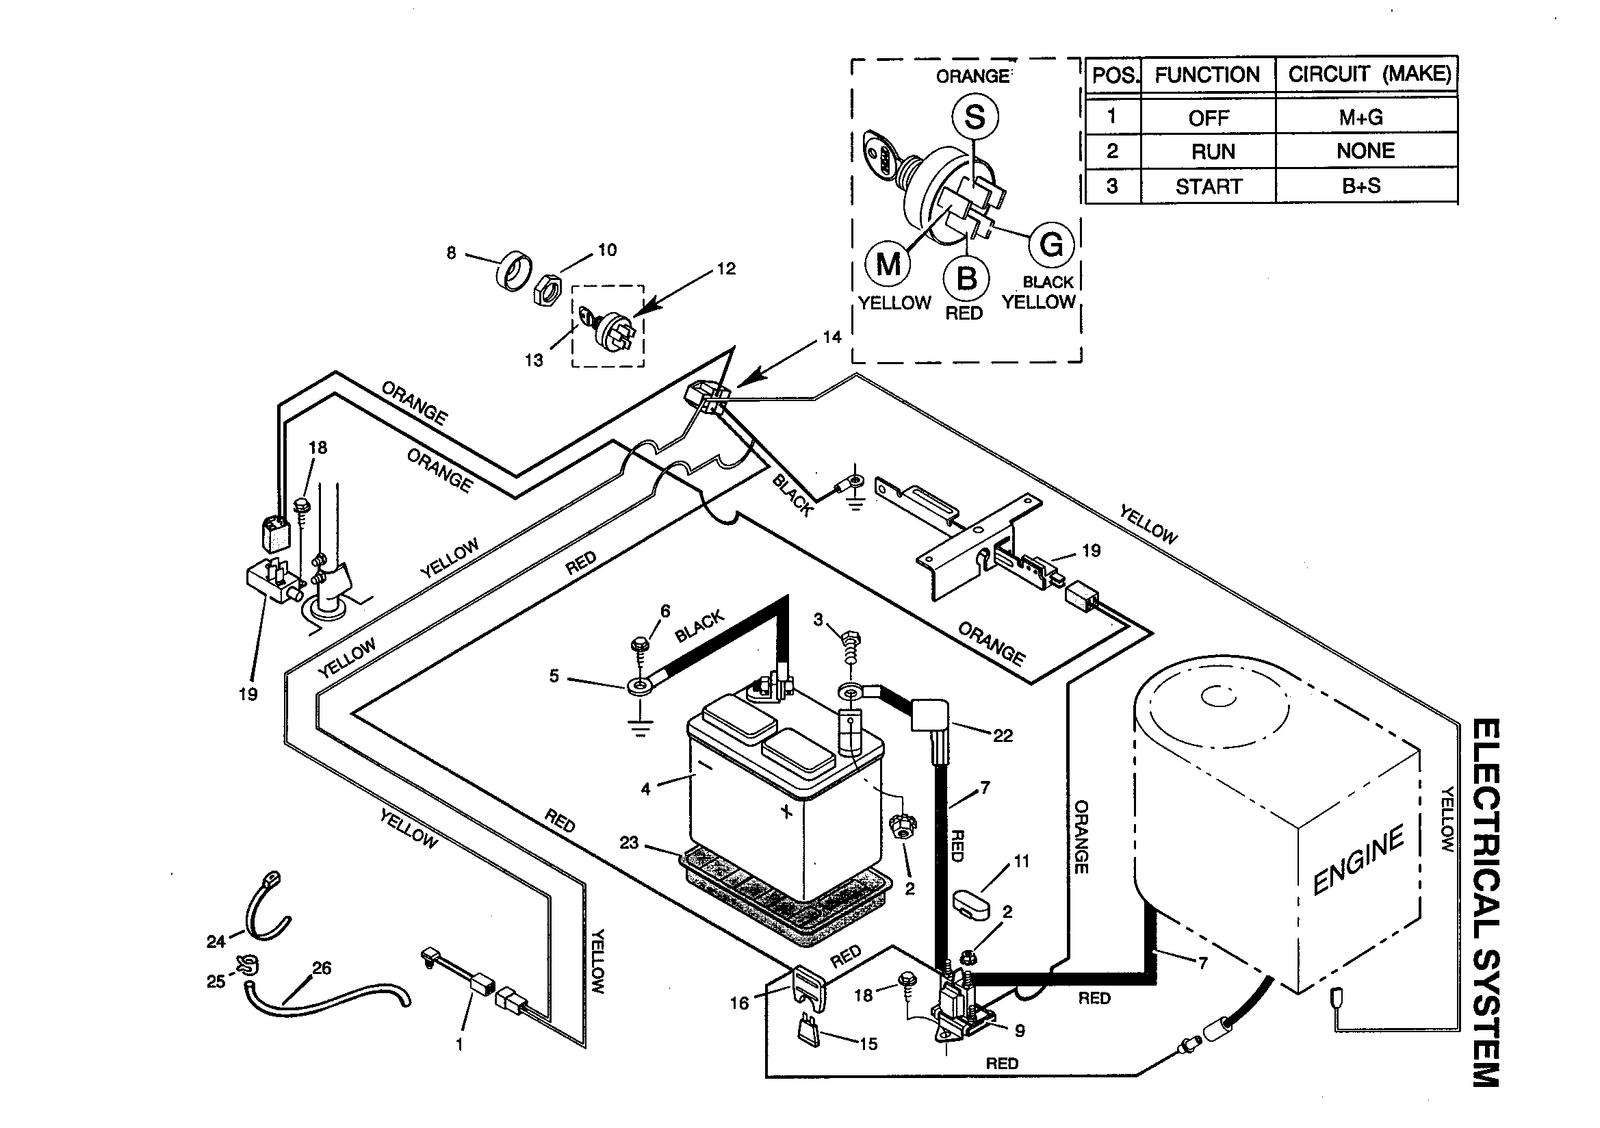 Starter solenoid wiring diagram from battery to solenoid craftsman 2006 troy bilt bronco relay wiring